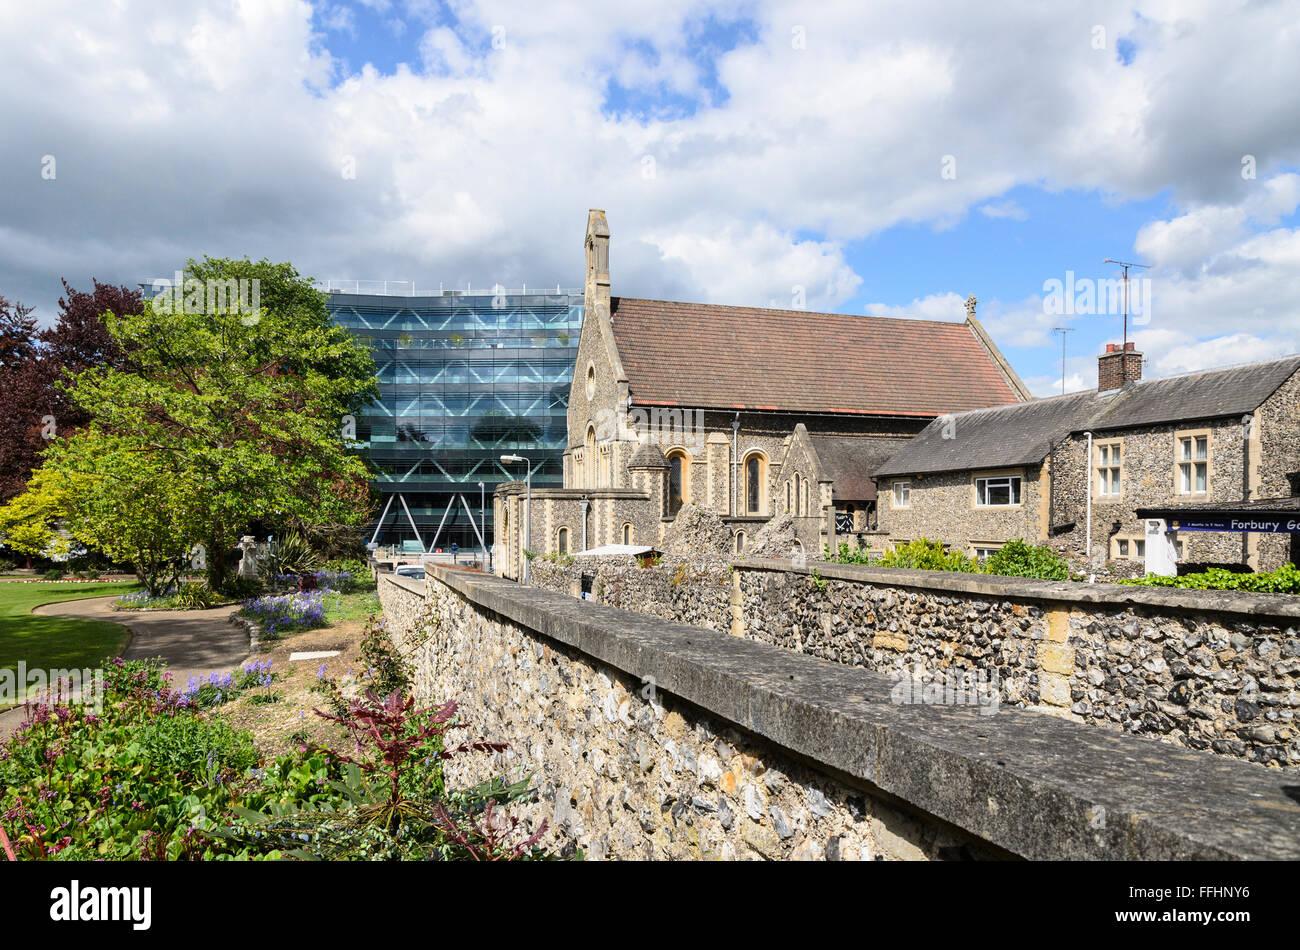 Forbury Gardens, Reading Abbey ruins and St James Roman Catholic Church, Reading, Berkshire, England, UK. Stock Photo